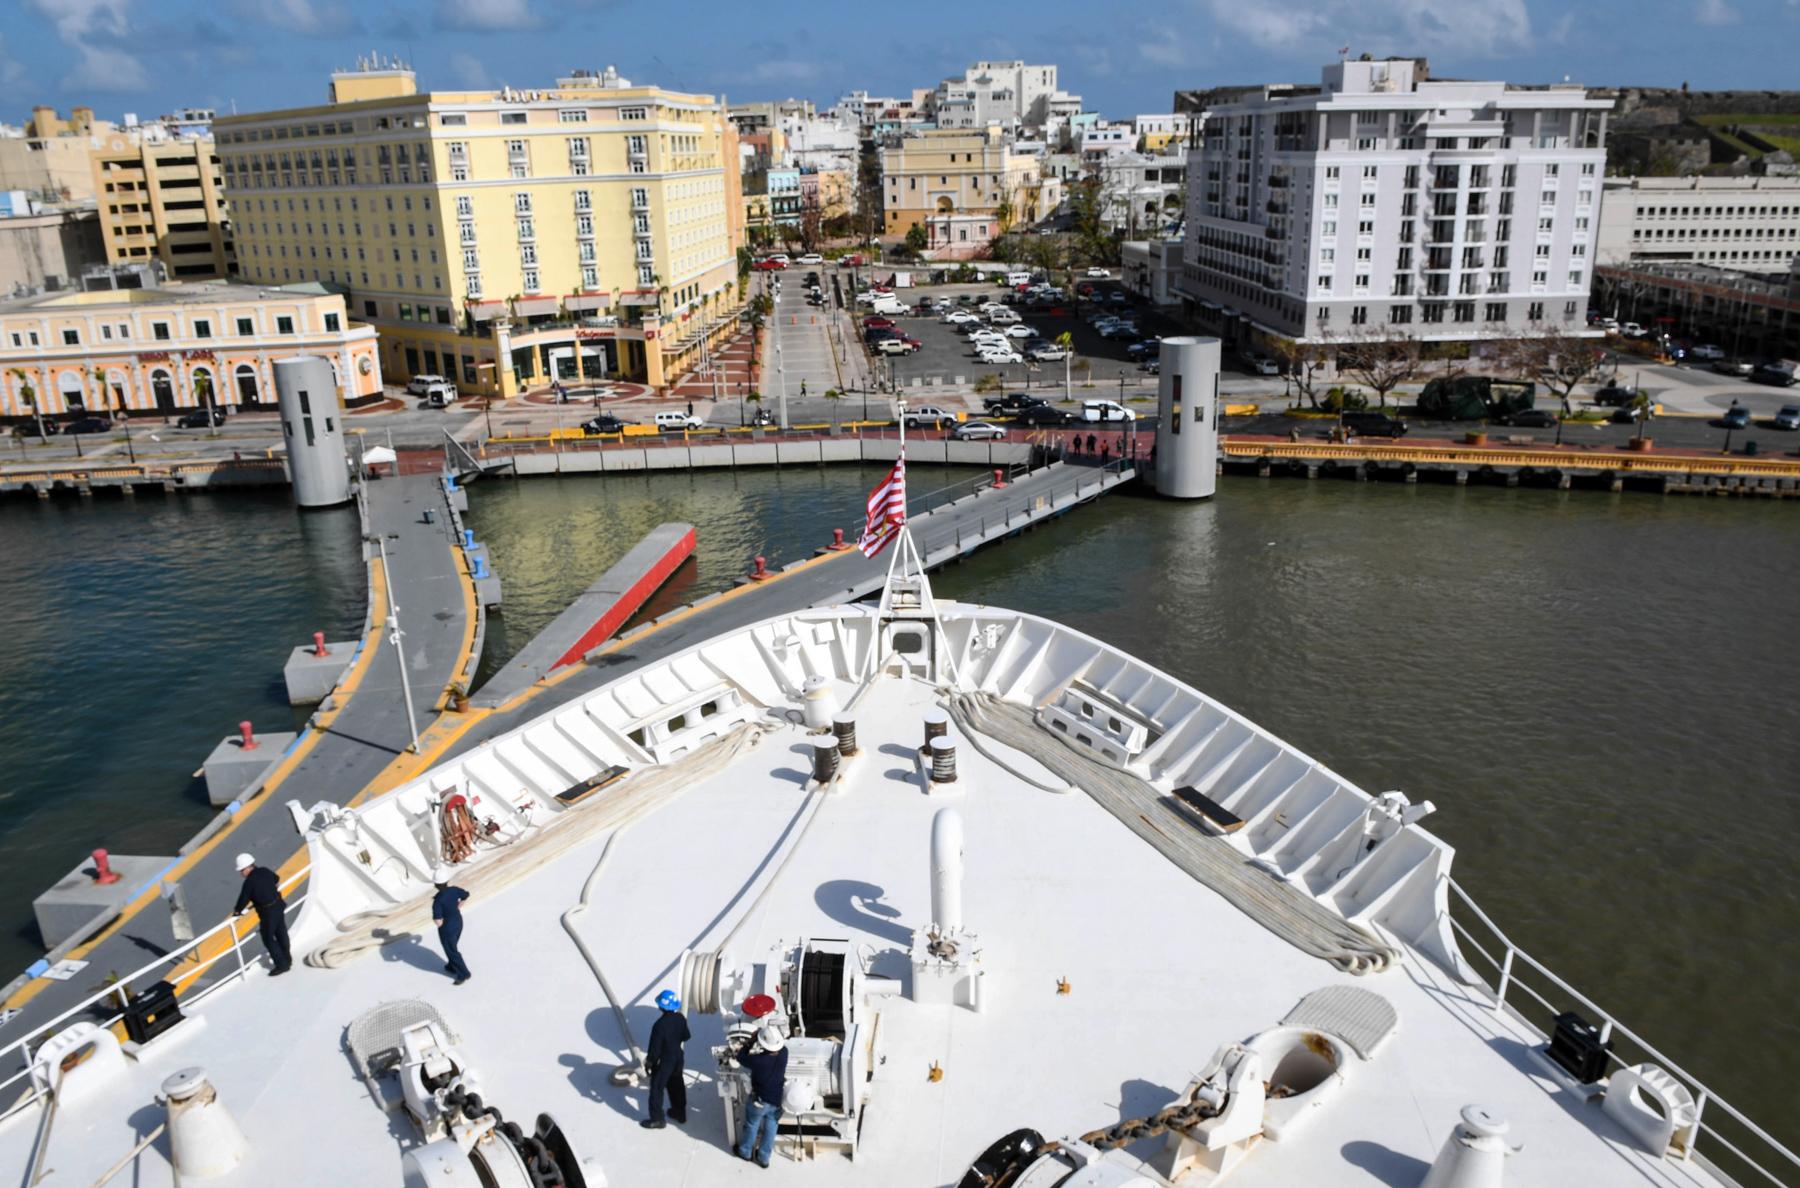 Naval ship arriving in port (U.S. Navy)